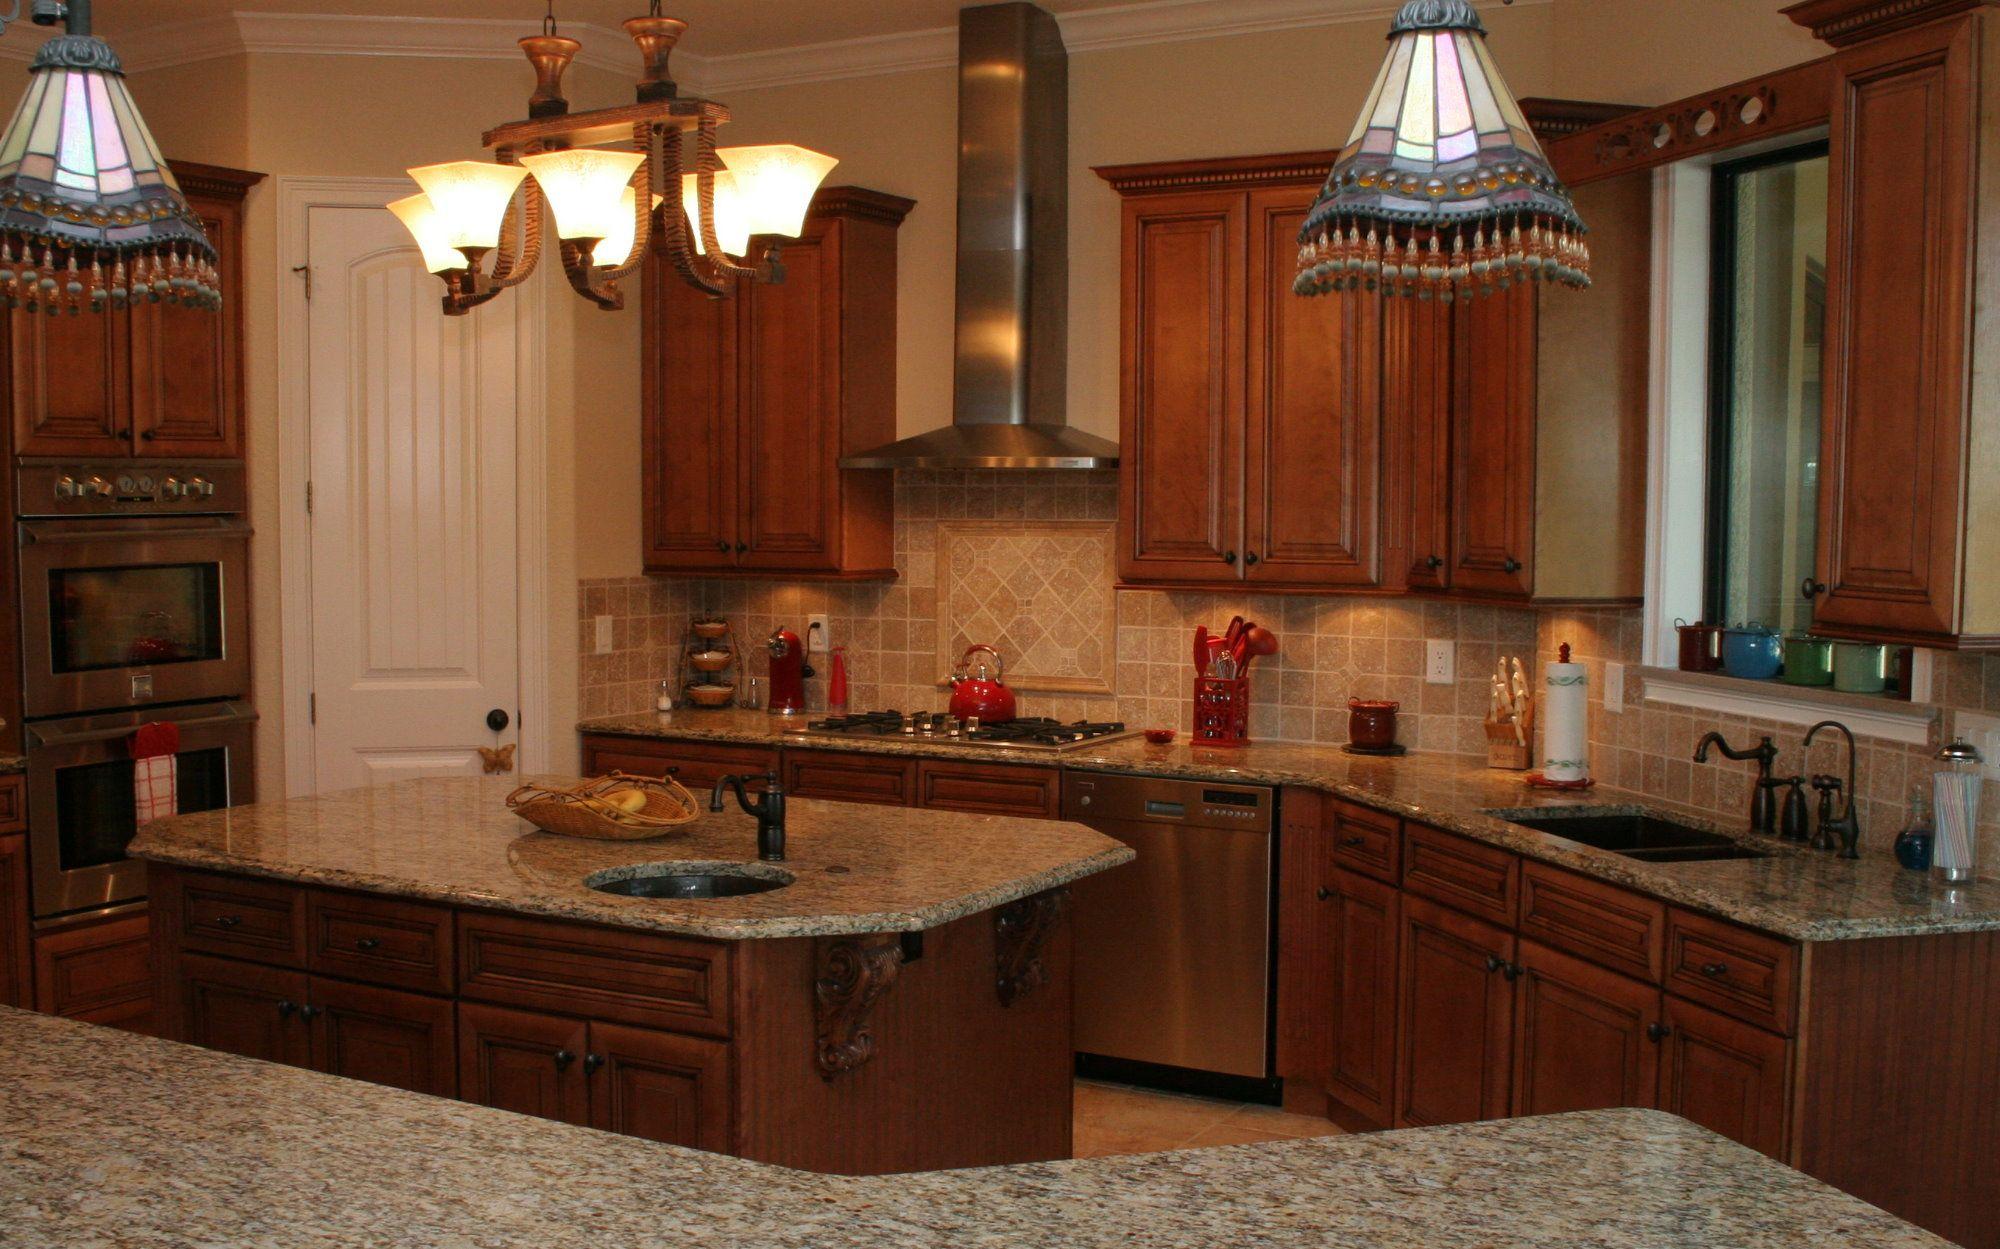 Italian style kitchen design ideas tuscan home decor style